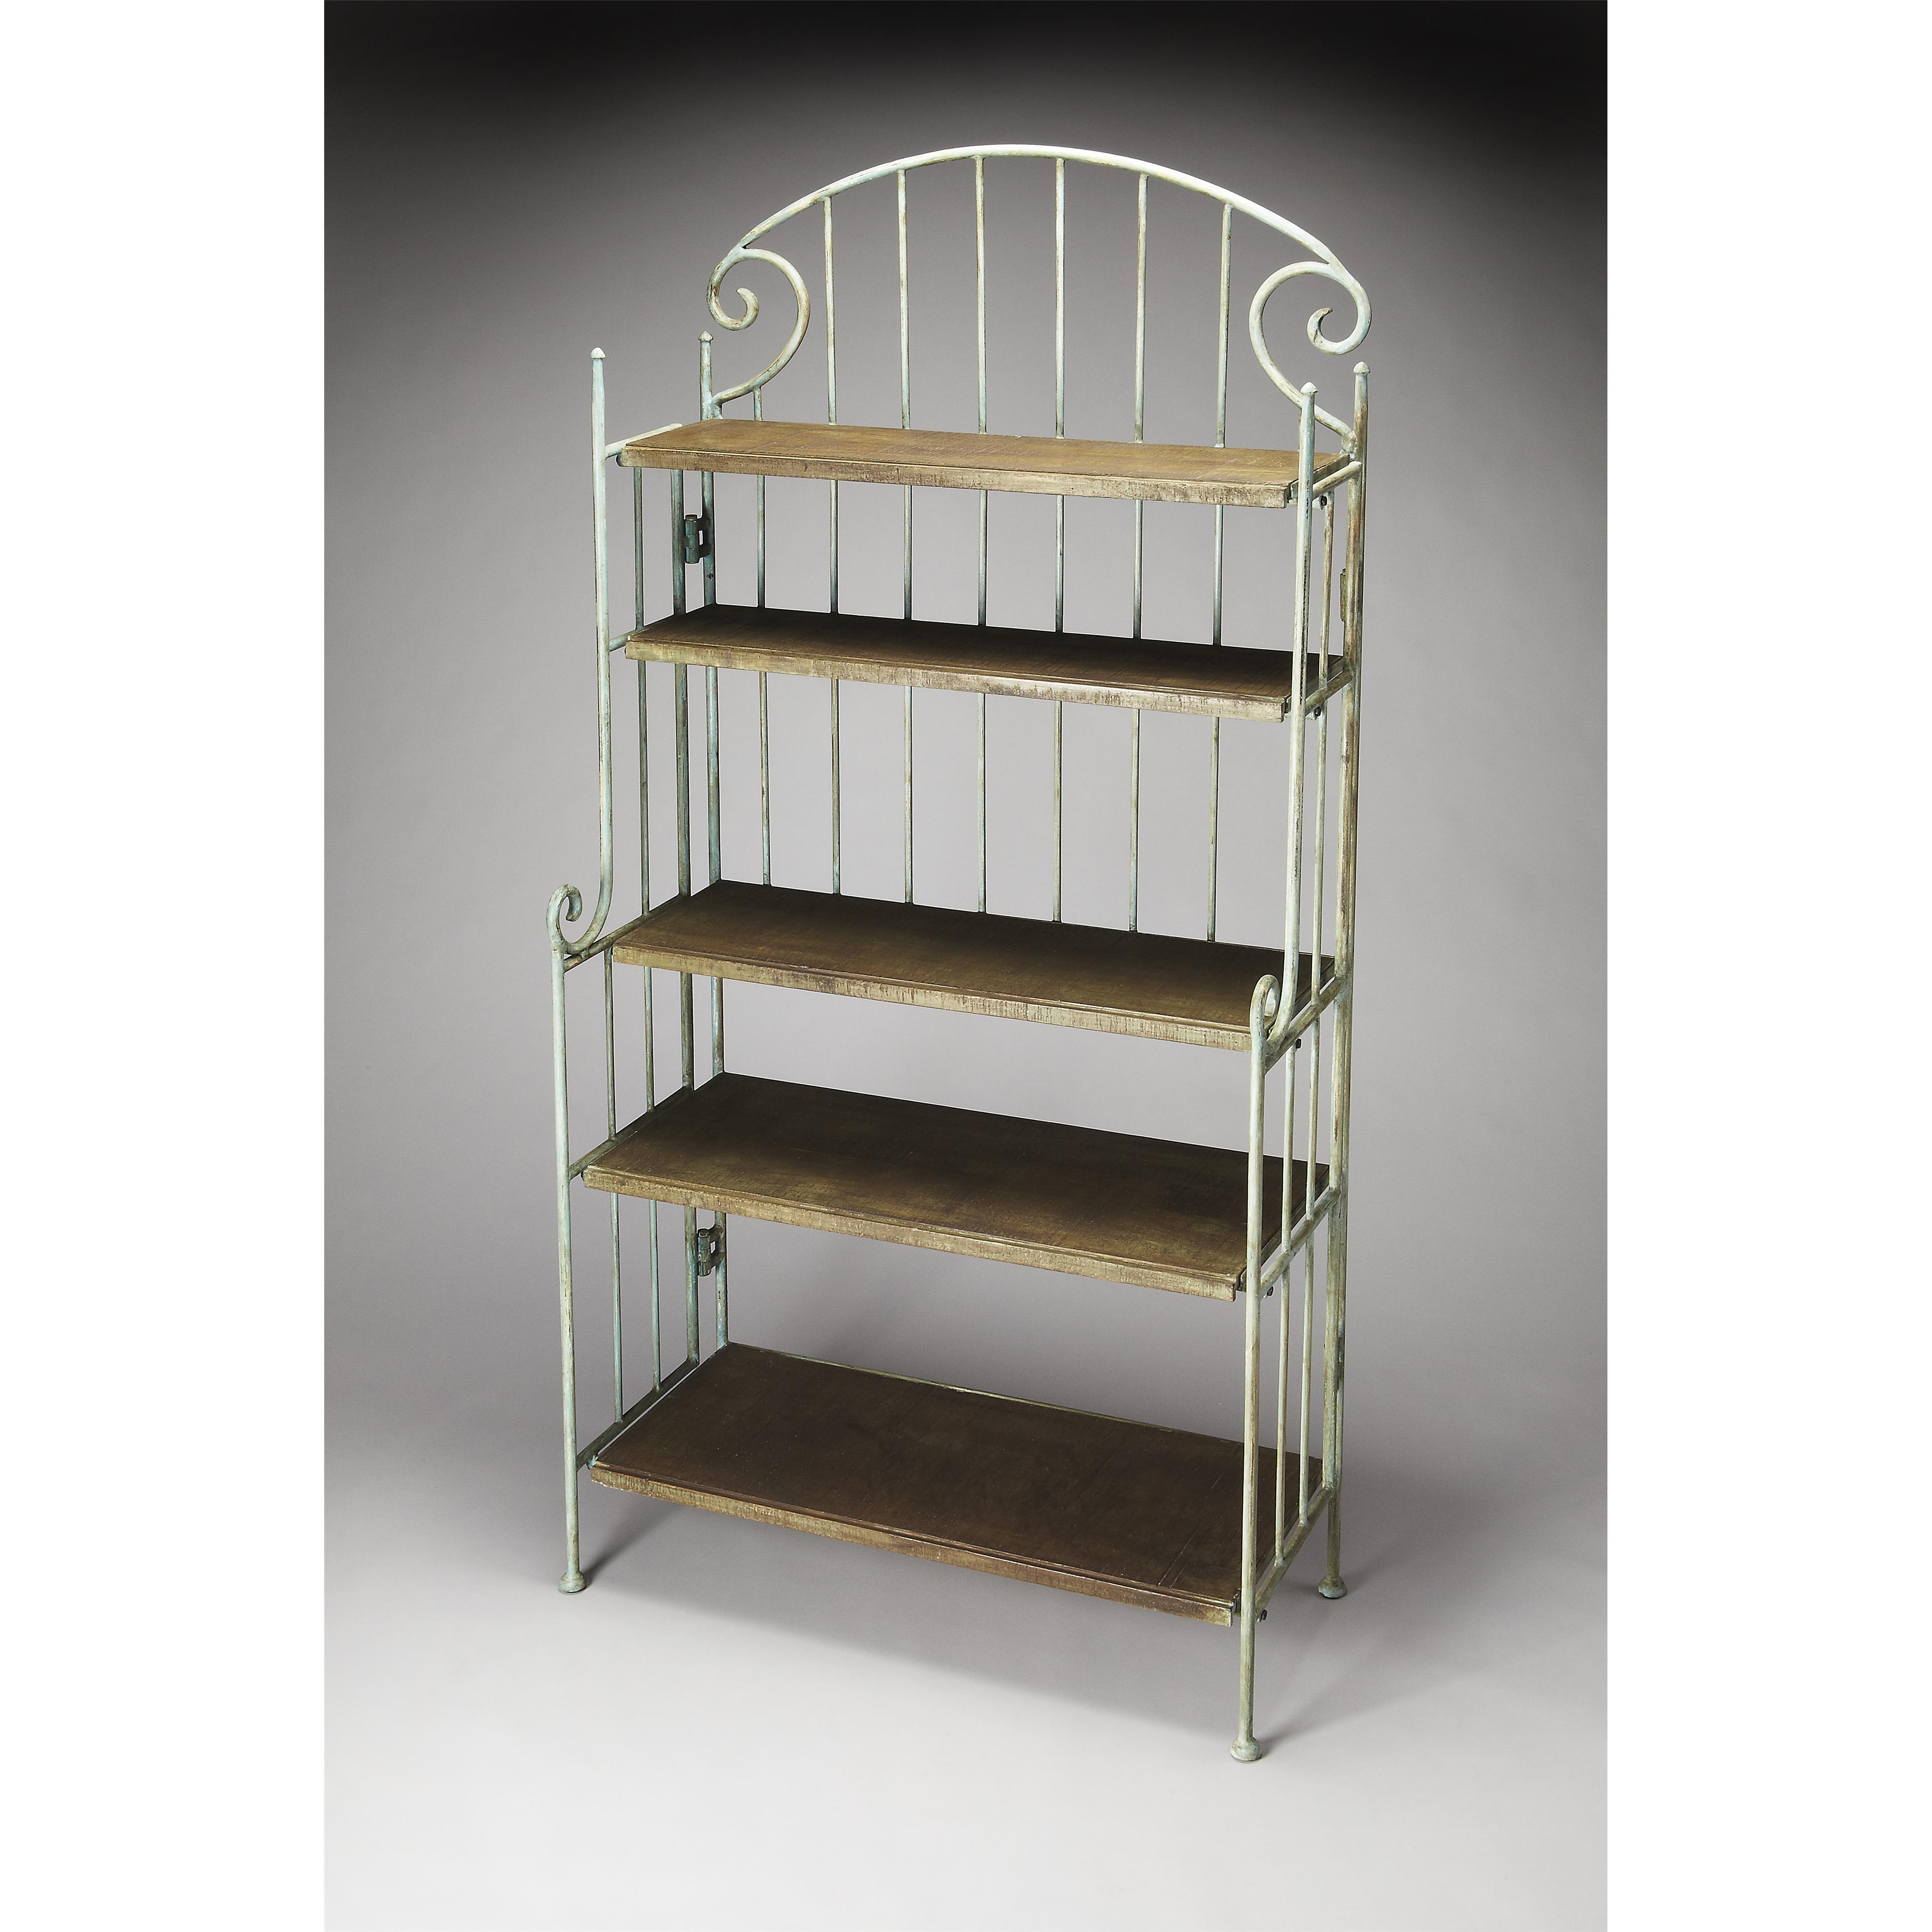 Butler Specialty Company Metalworks Baker's Rack - Item Number: 3250025